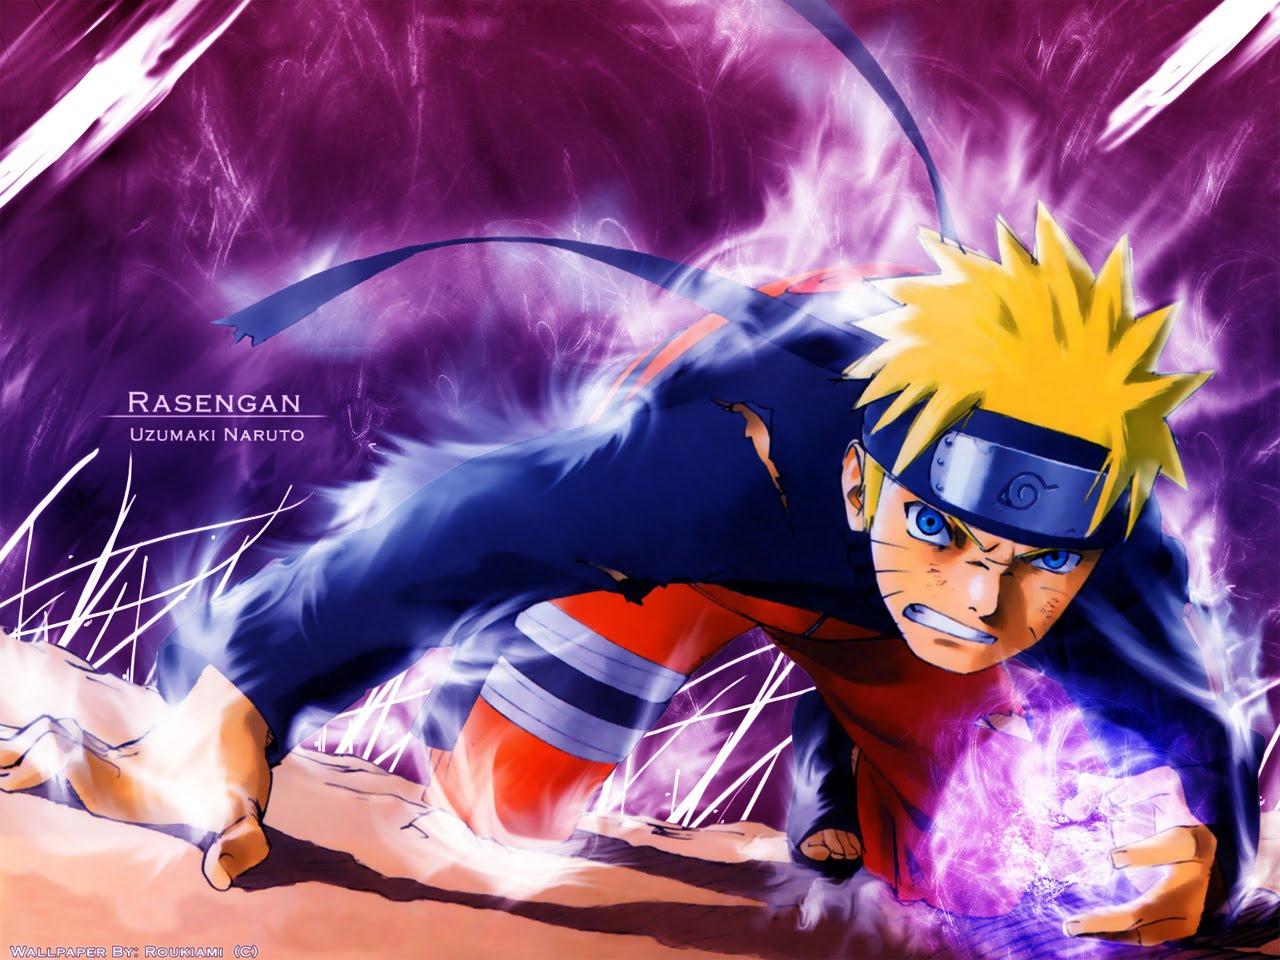 Naruto Vs Sasuke 55 Hd Wallpapers in Cartoons   Imagescicom 1280x960